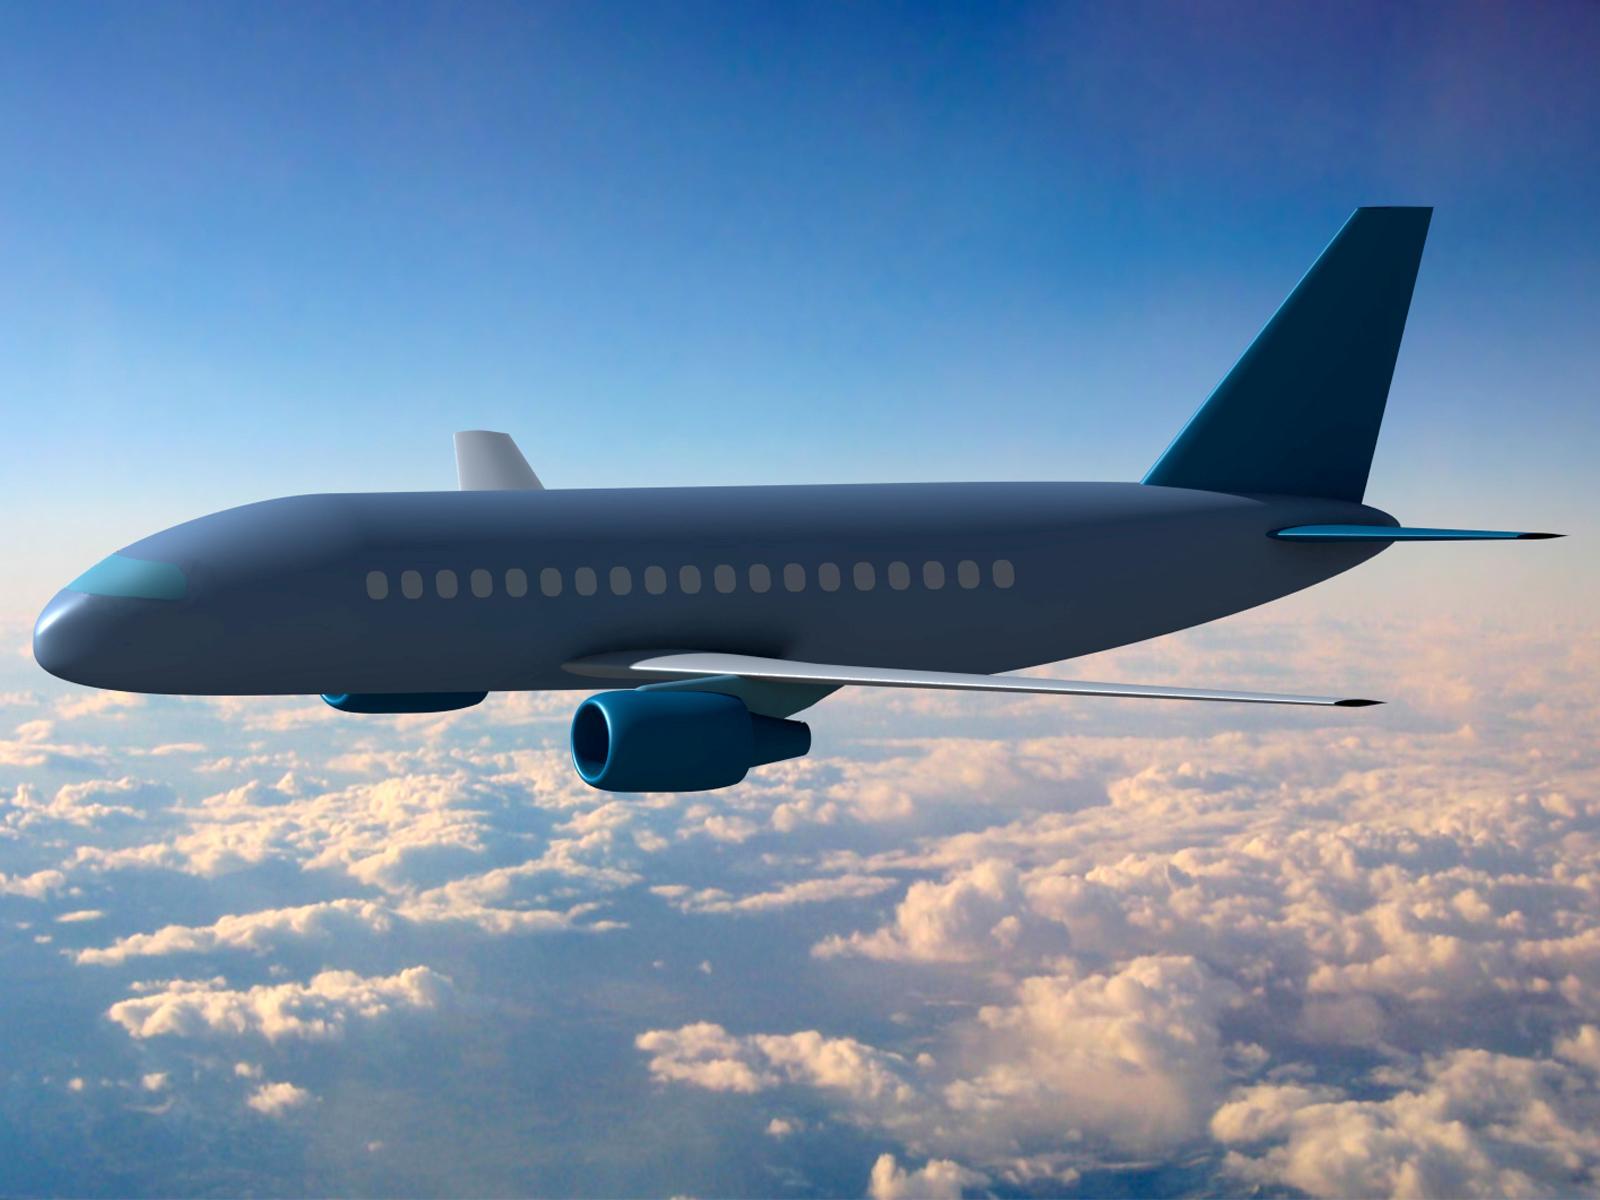 Northrop Grumman: Not Business as Usual